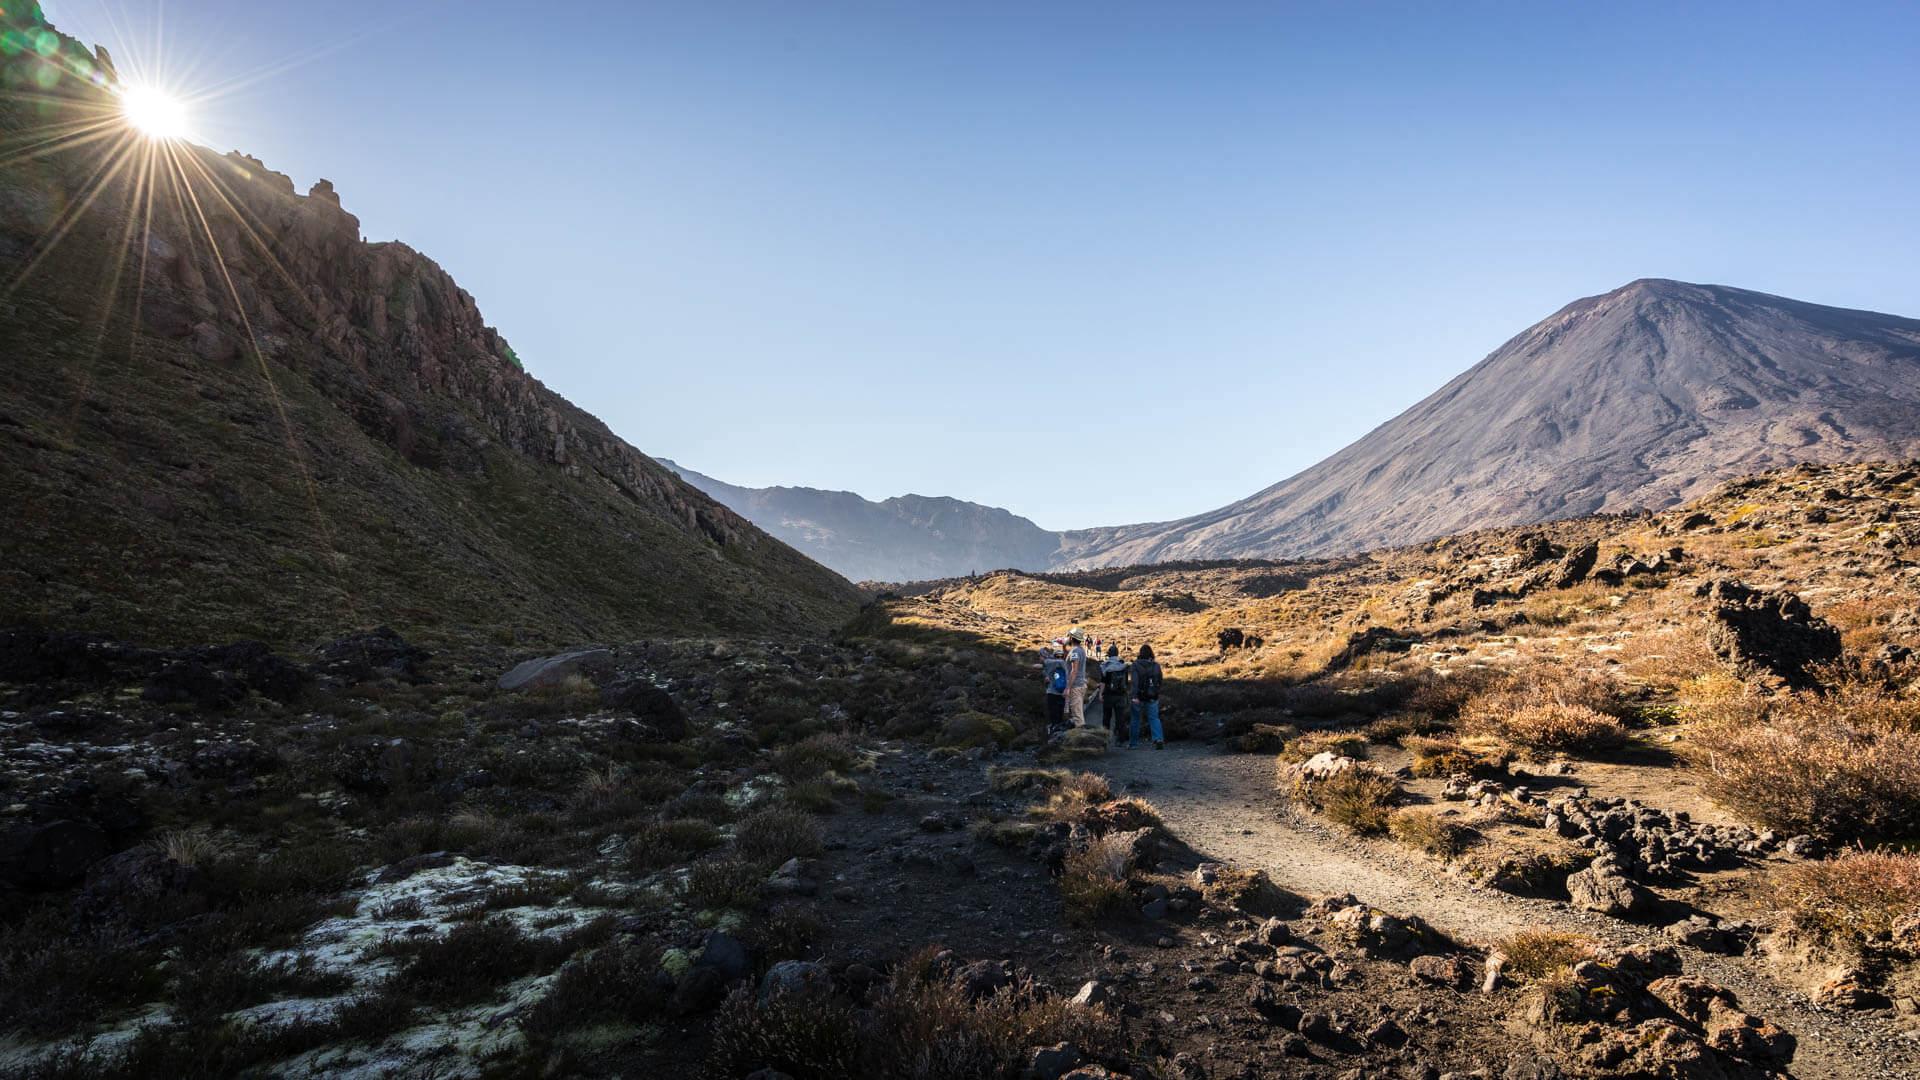 Premiers pas sur le Tongariro Alpine Crossing